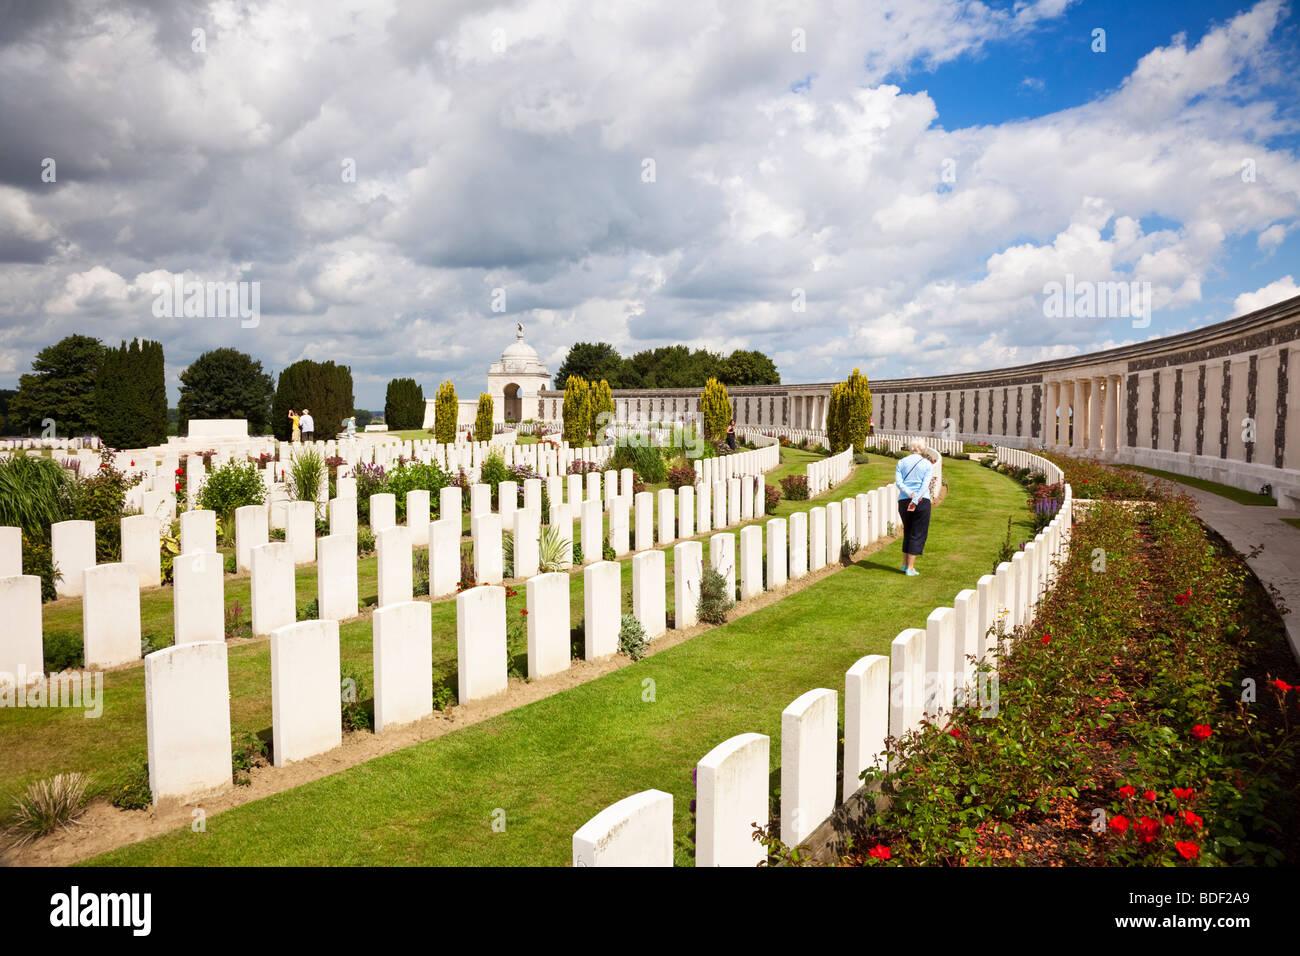 The Tyne Cot World War 1 Commonwealth Military Cemetery at Passchendaele, Flanders, Belgium, Europe - Stock Image